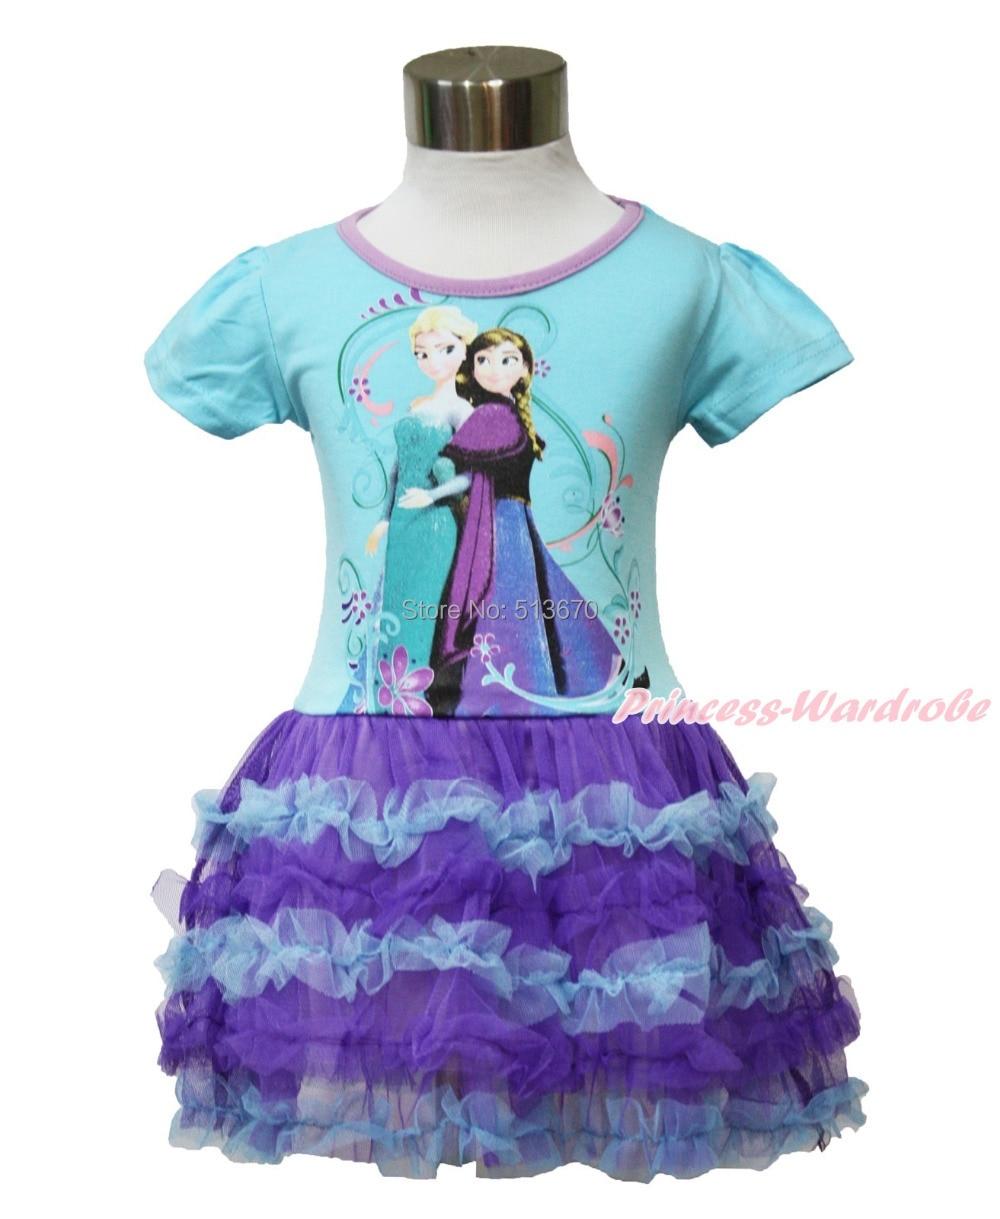 Snow Princess Elsa Anna Blue Short Sleeves Girl Purple Gauze Ruffle Dress 2-7Y MAC106